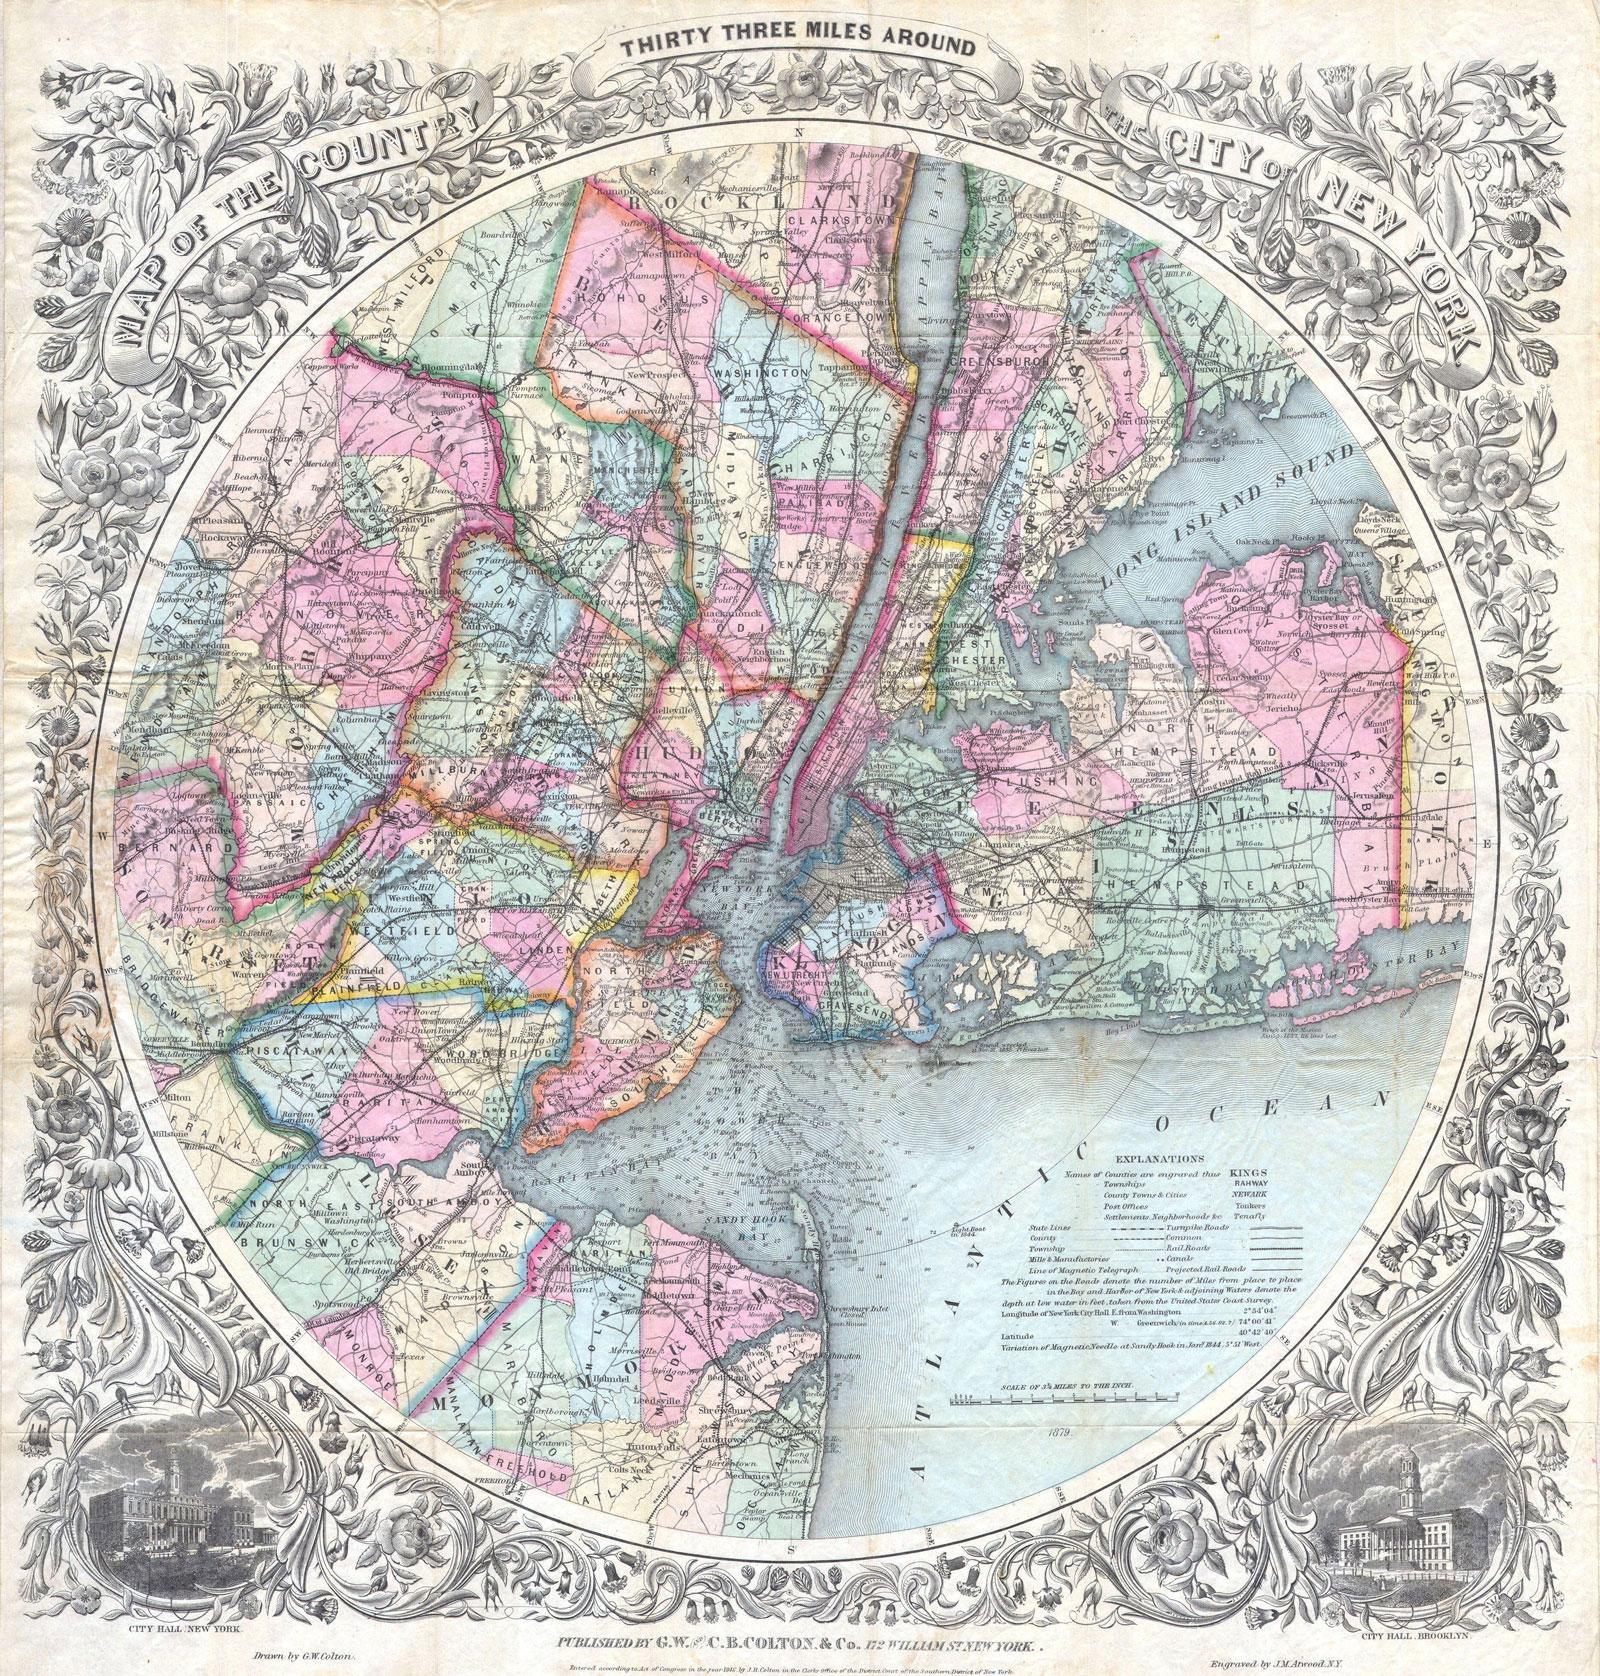 a nineteenth century map of New York City